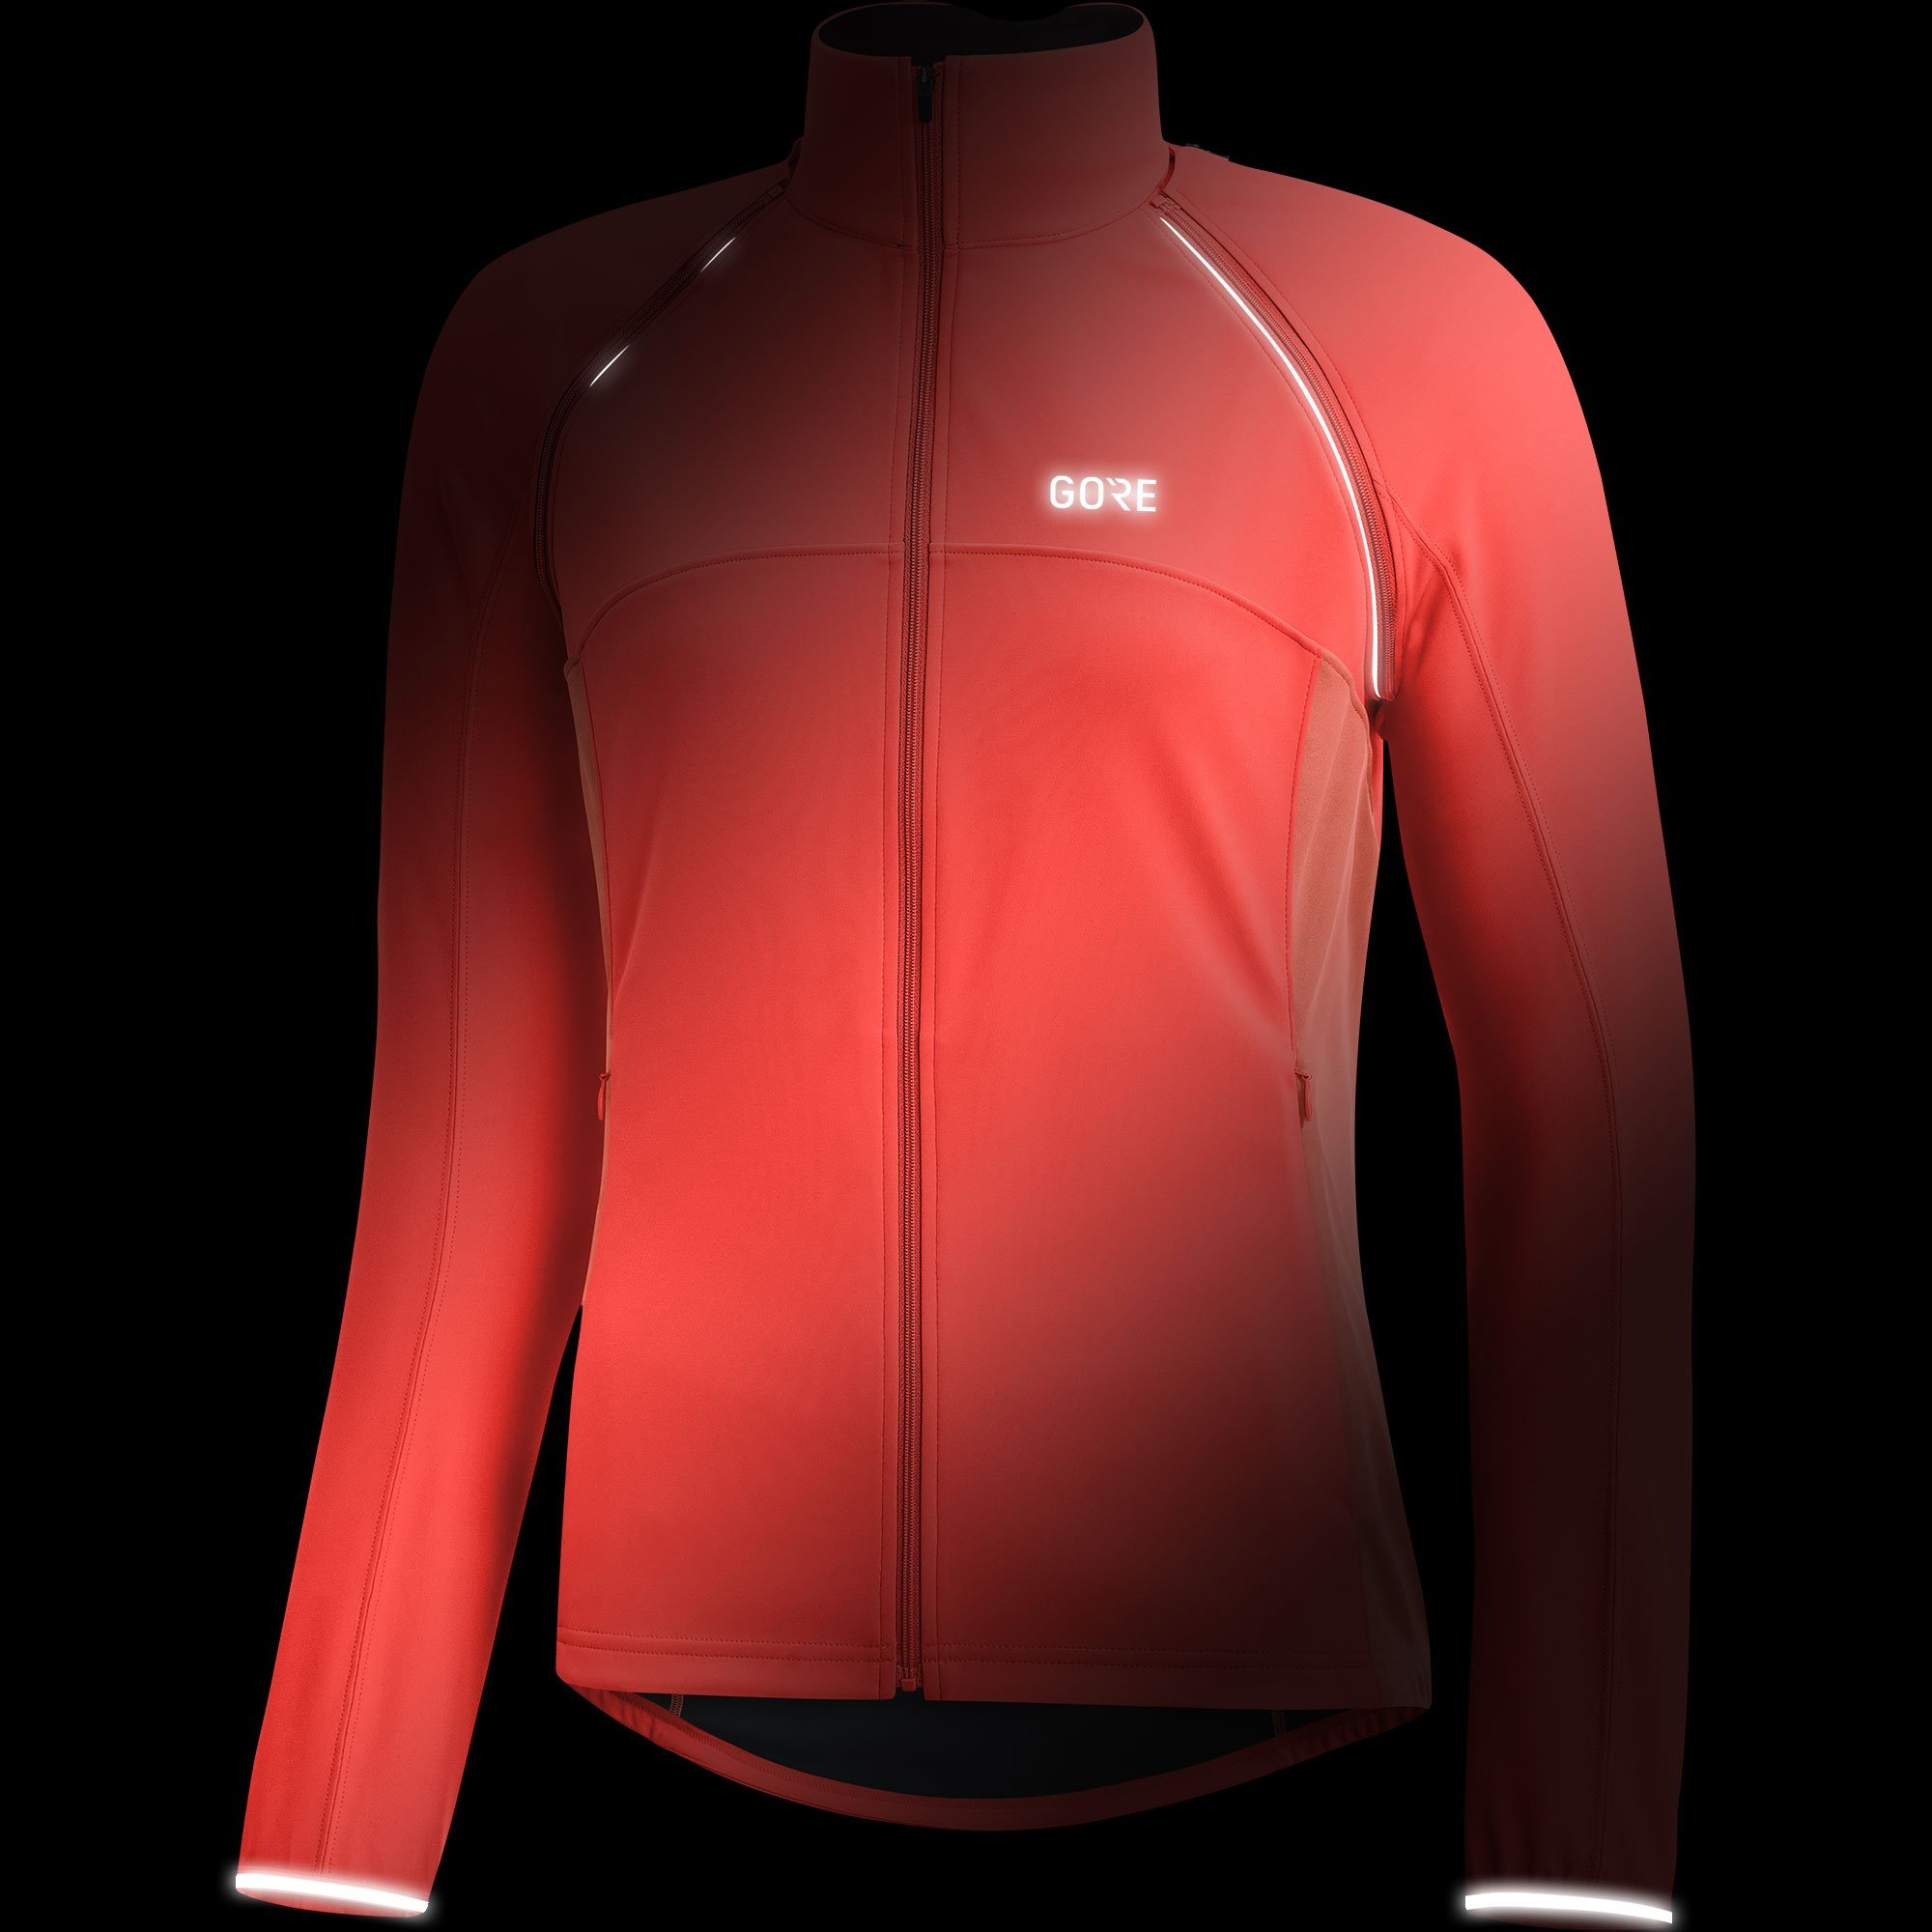 GORE Wear Women's Windproof Cycling Jacket, Removable Sleeves, GORE Wear C3 Women's GORE Wear WINDSTOPPER Phantom Zip-Off Jacket, Size: L, Color: Lumi Orange/Coral Glow, 100191 by GORE WEAR (Image #2)